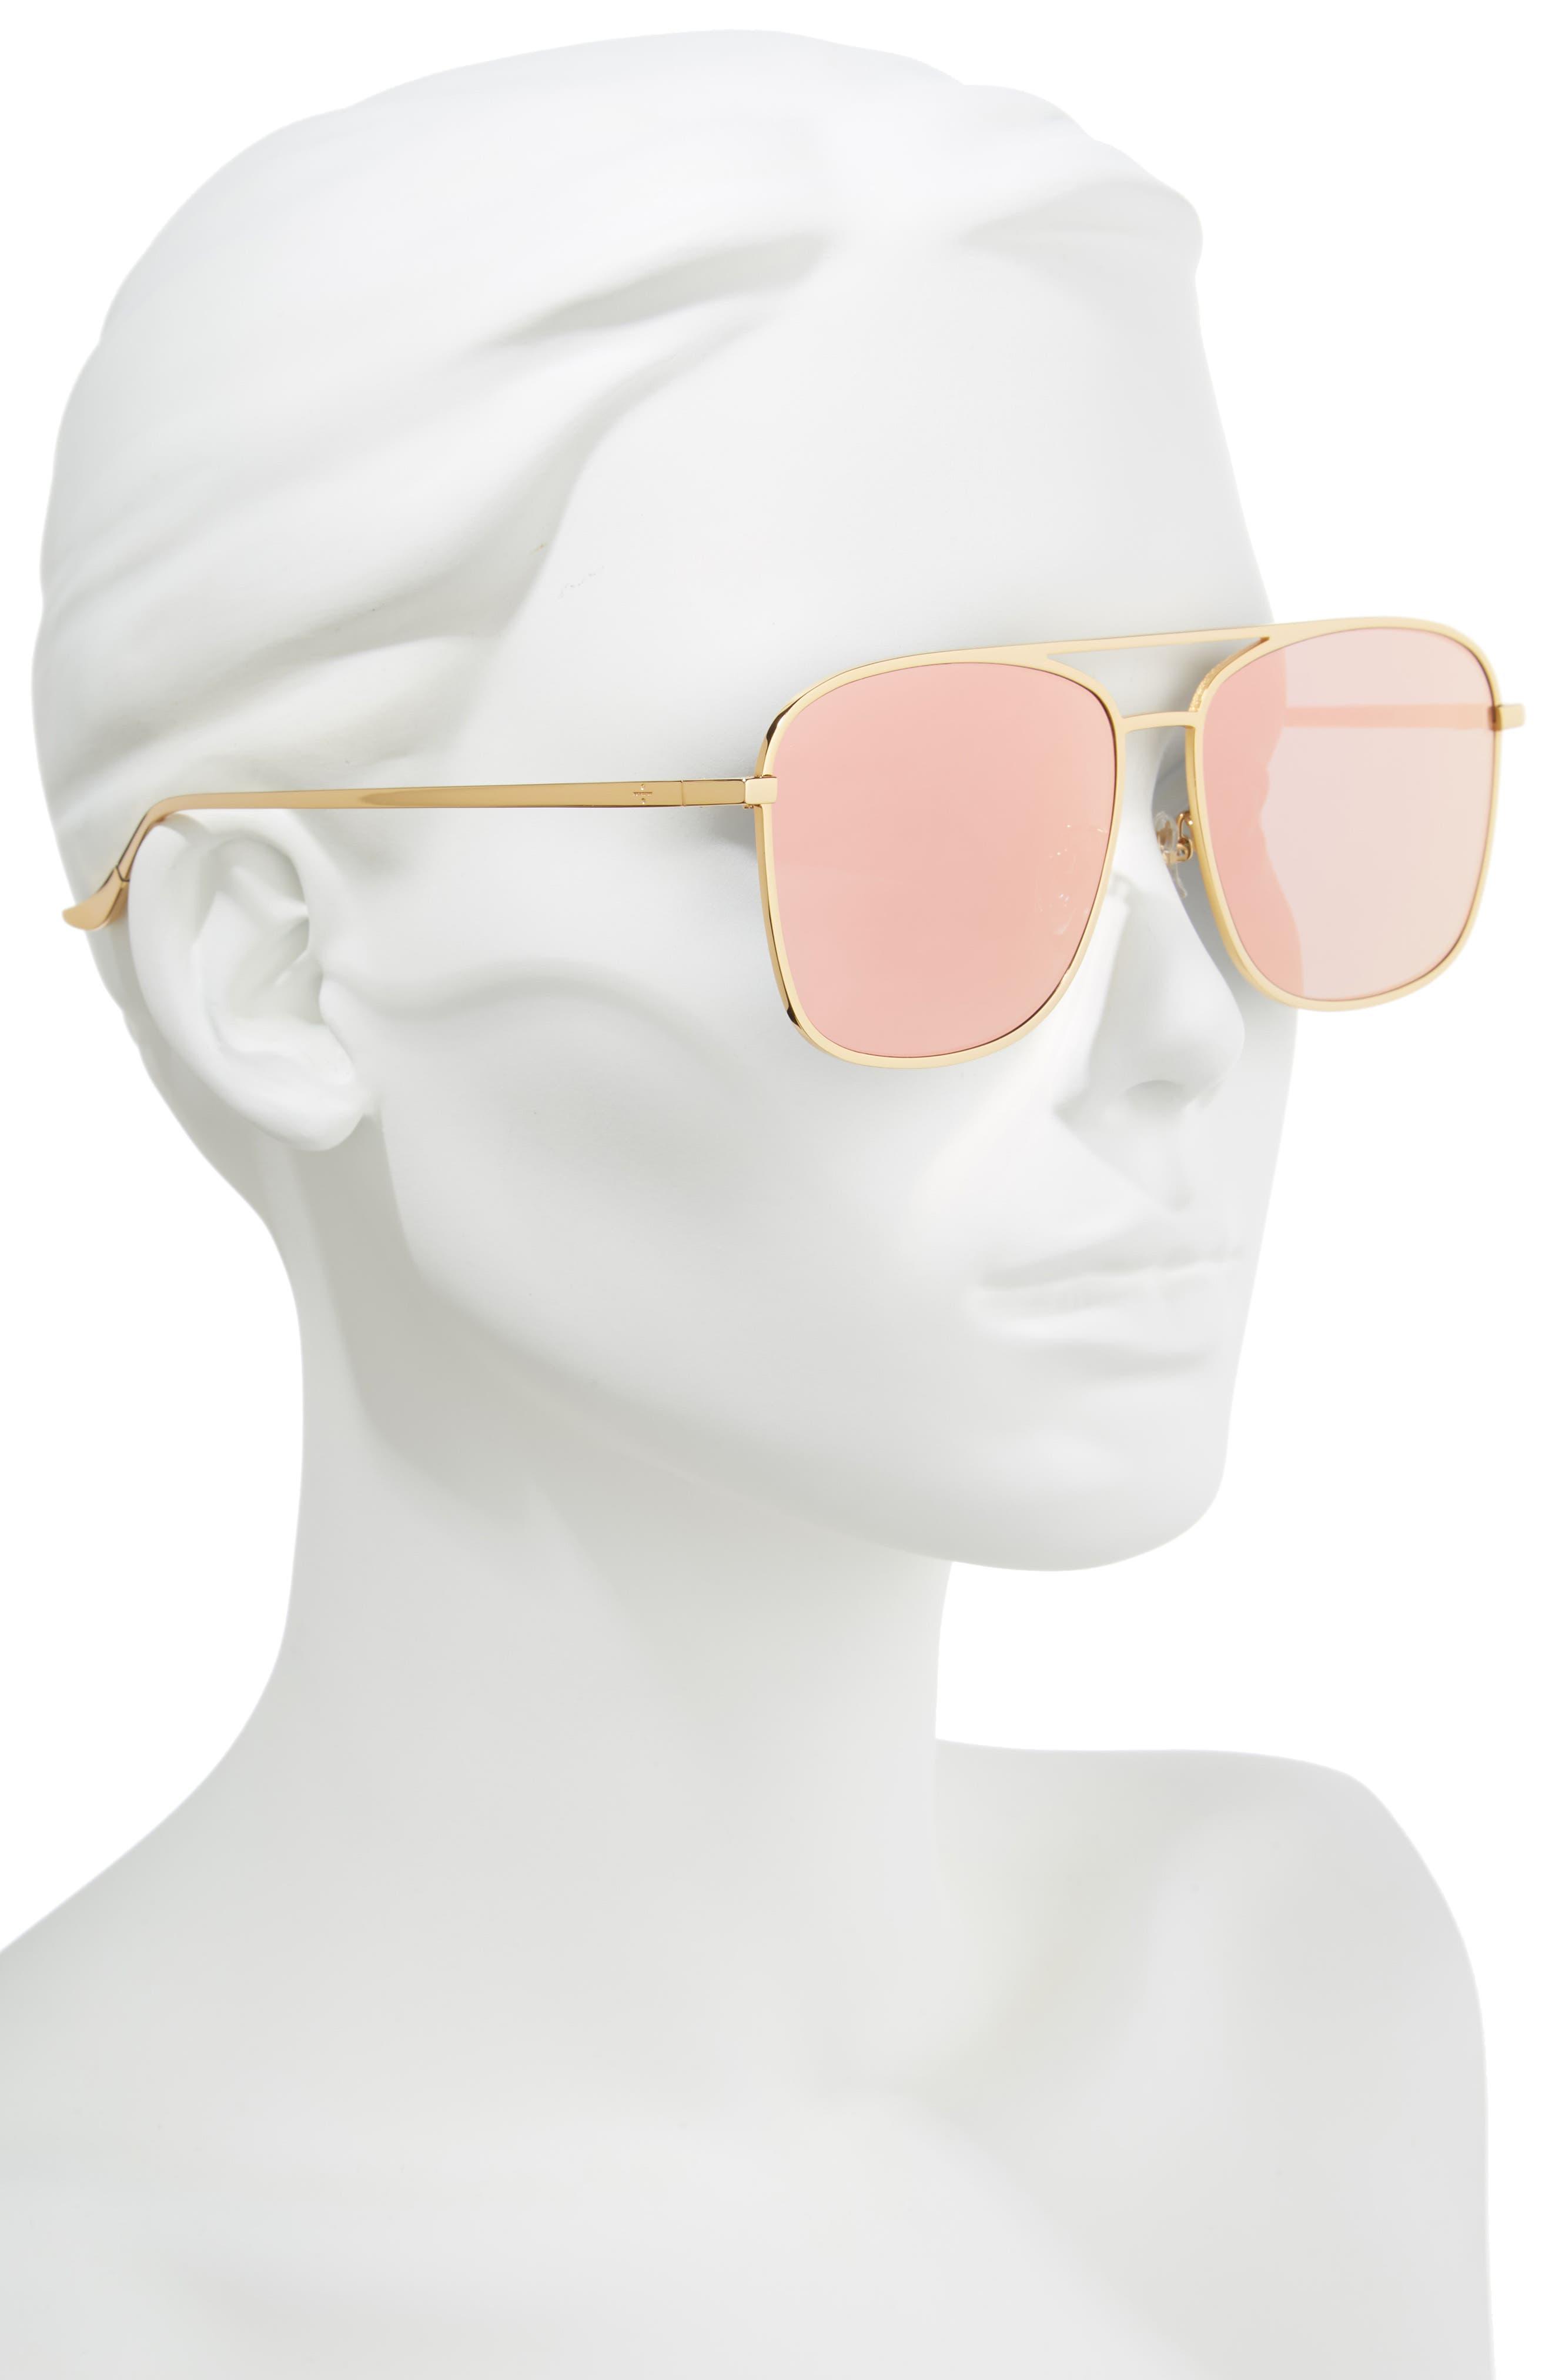 BLANC & ECLARE Geneva 61mm Large Polarized Metal Aviator Sunglasses,                             Alternate thumbnail 2, color,                             Gold/ Pink